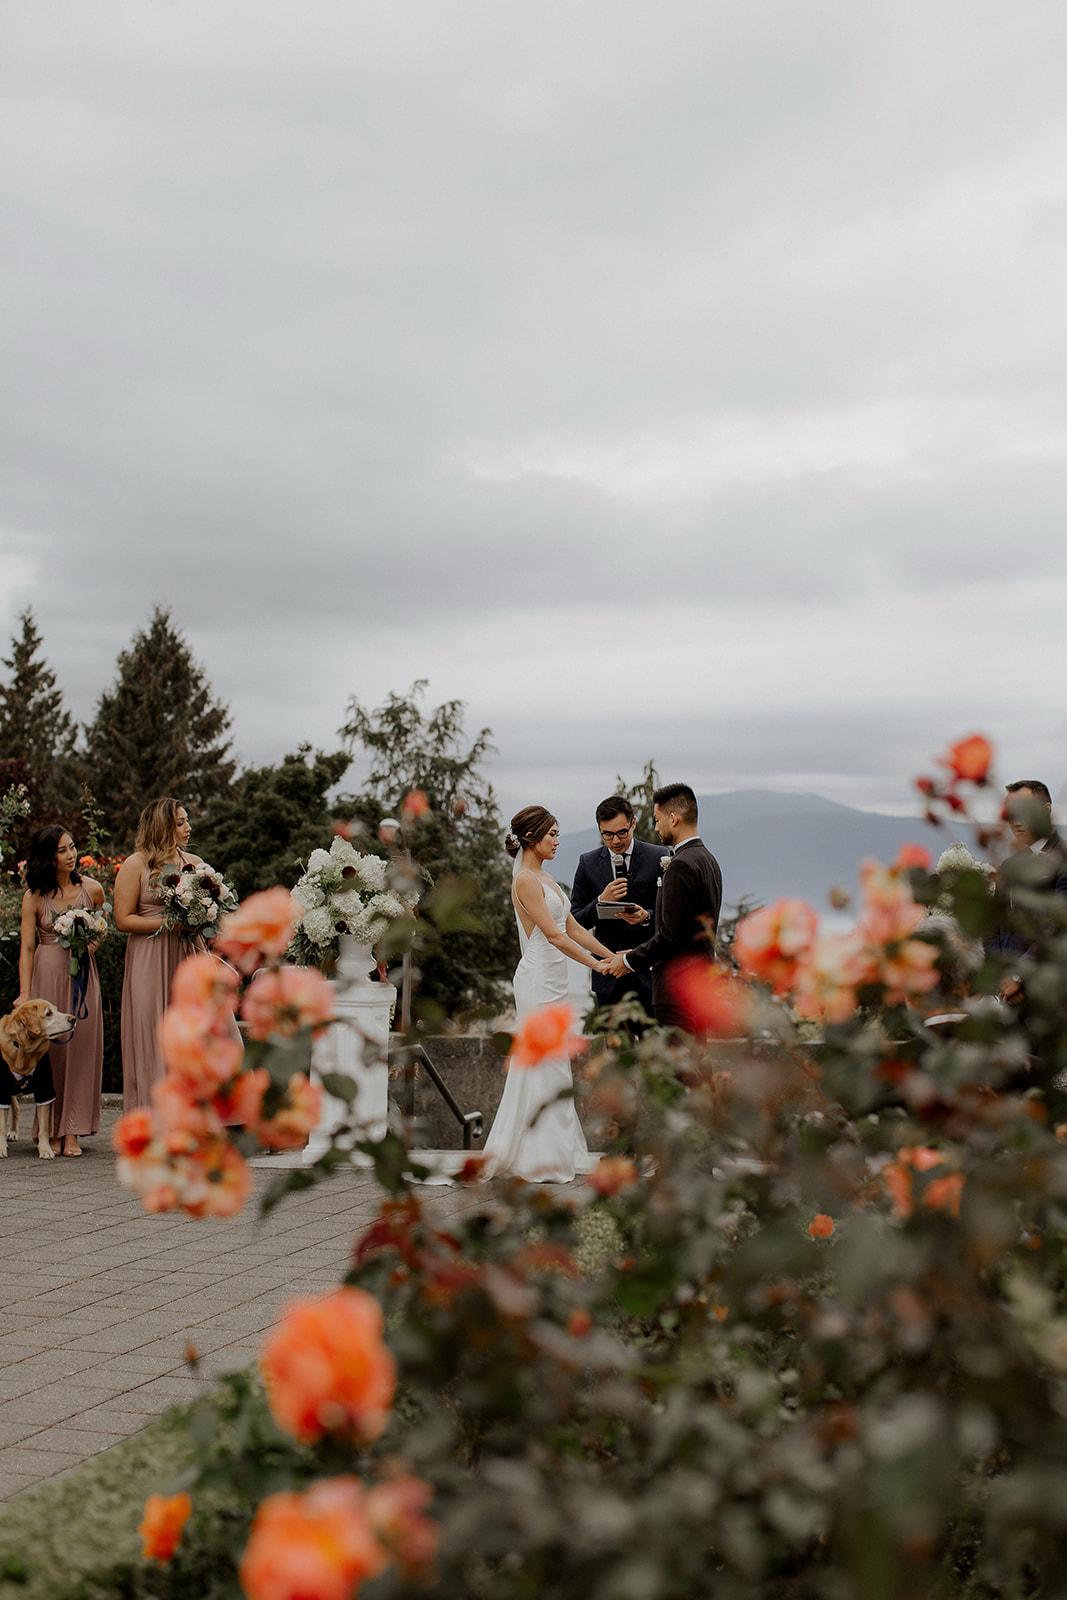 UBC Rose Garden Couple recite wedding vows in Vancouver by Elle Weddings